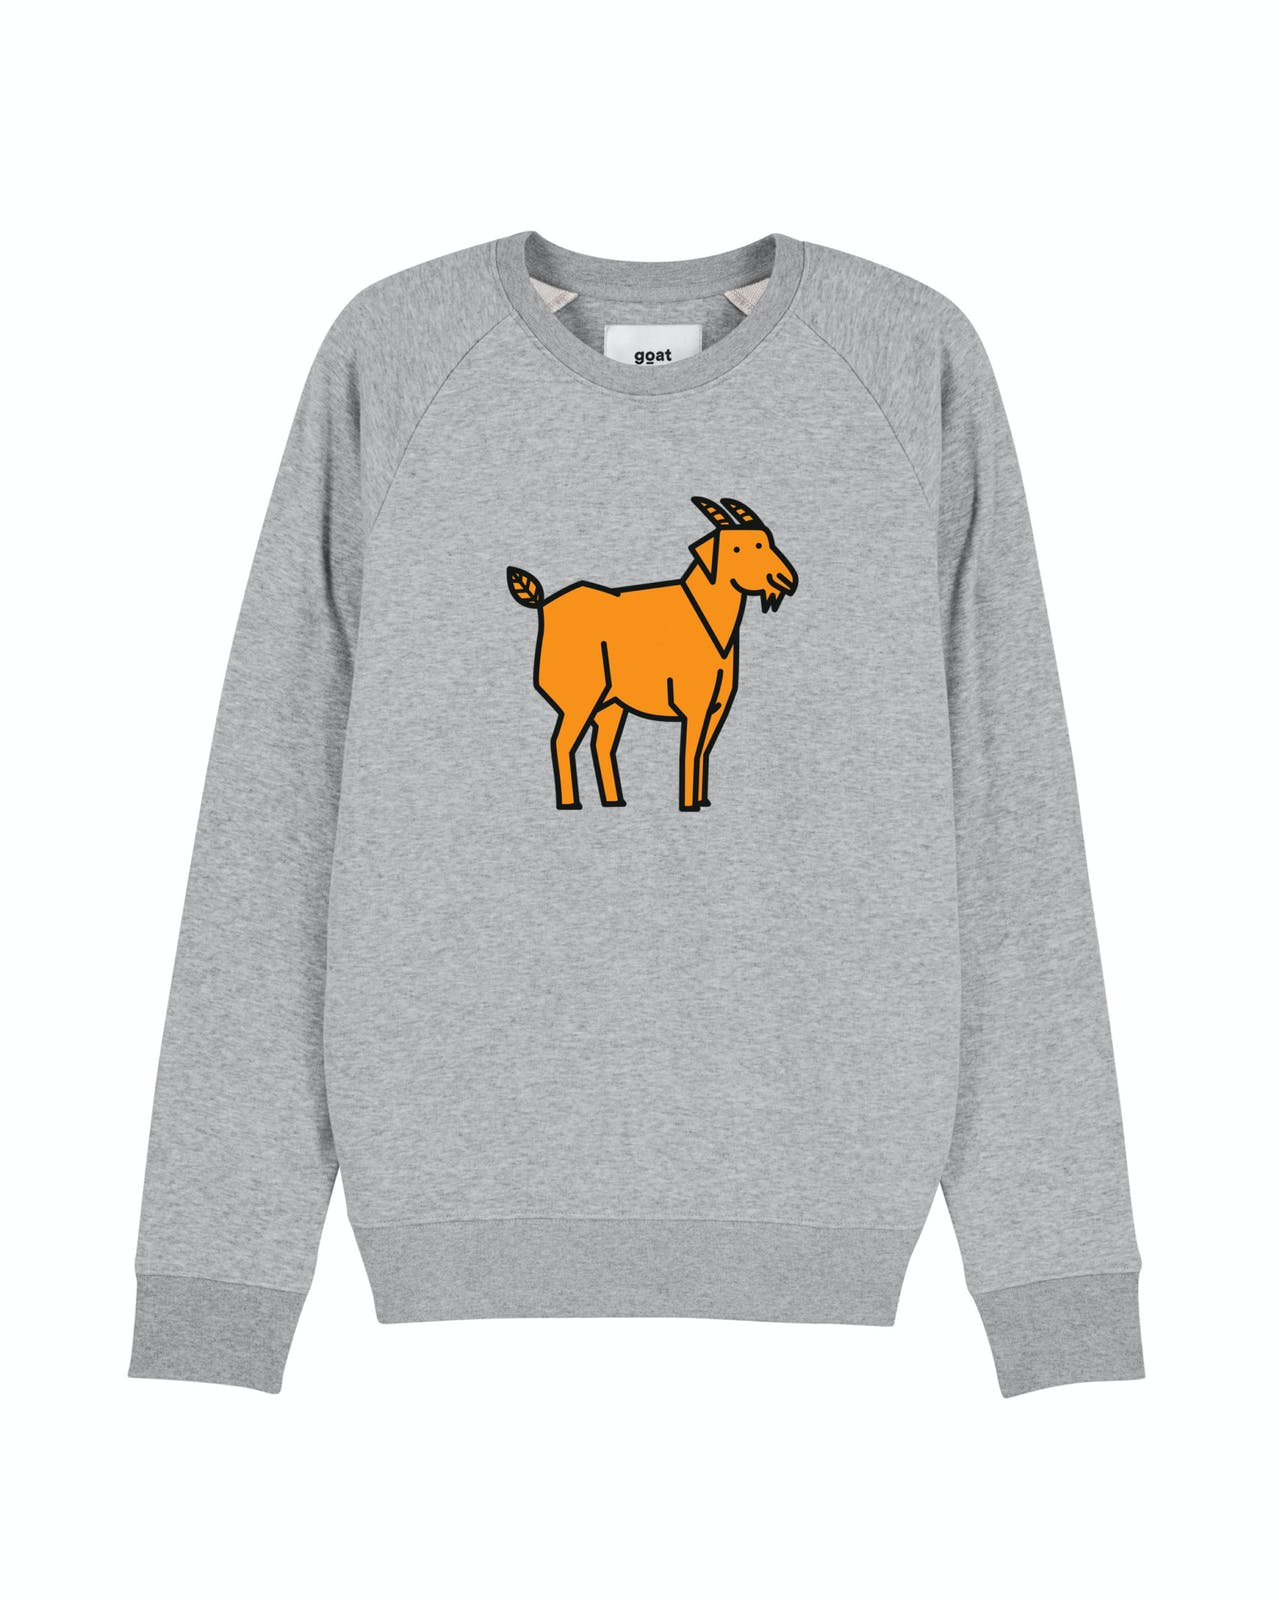 Goat Organic Apparel Max goat grey